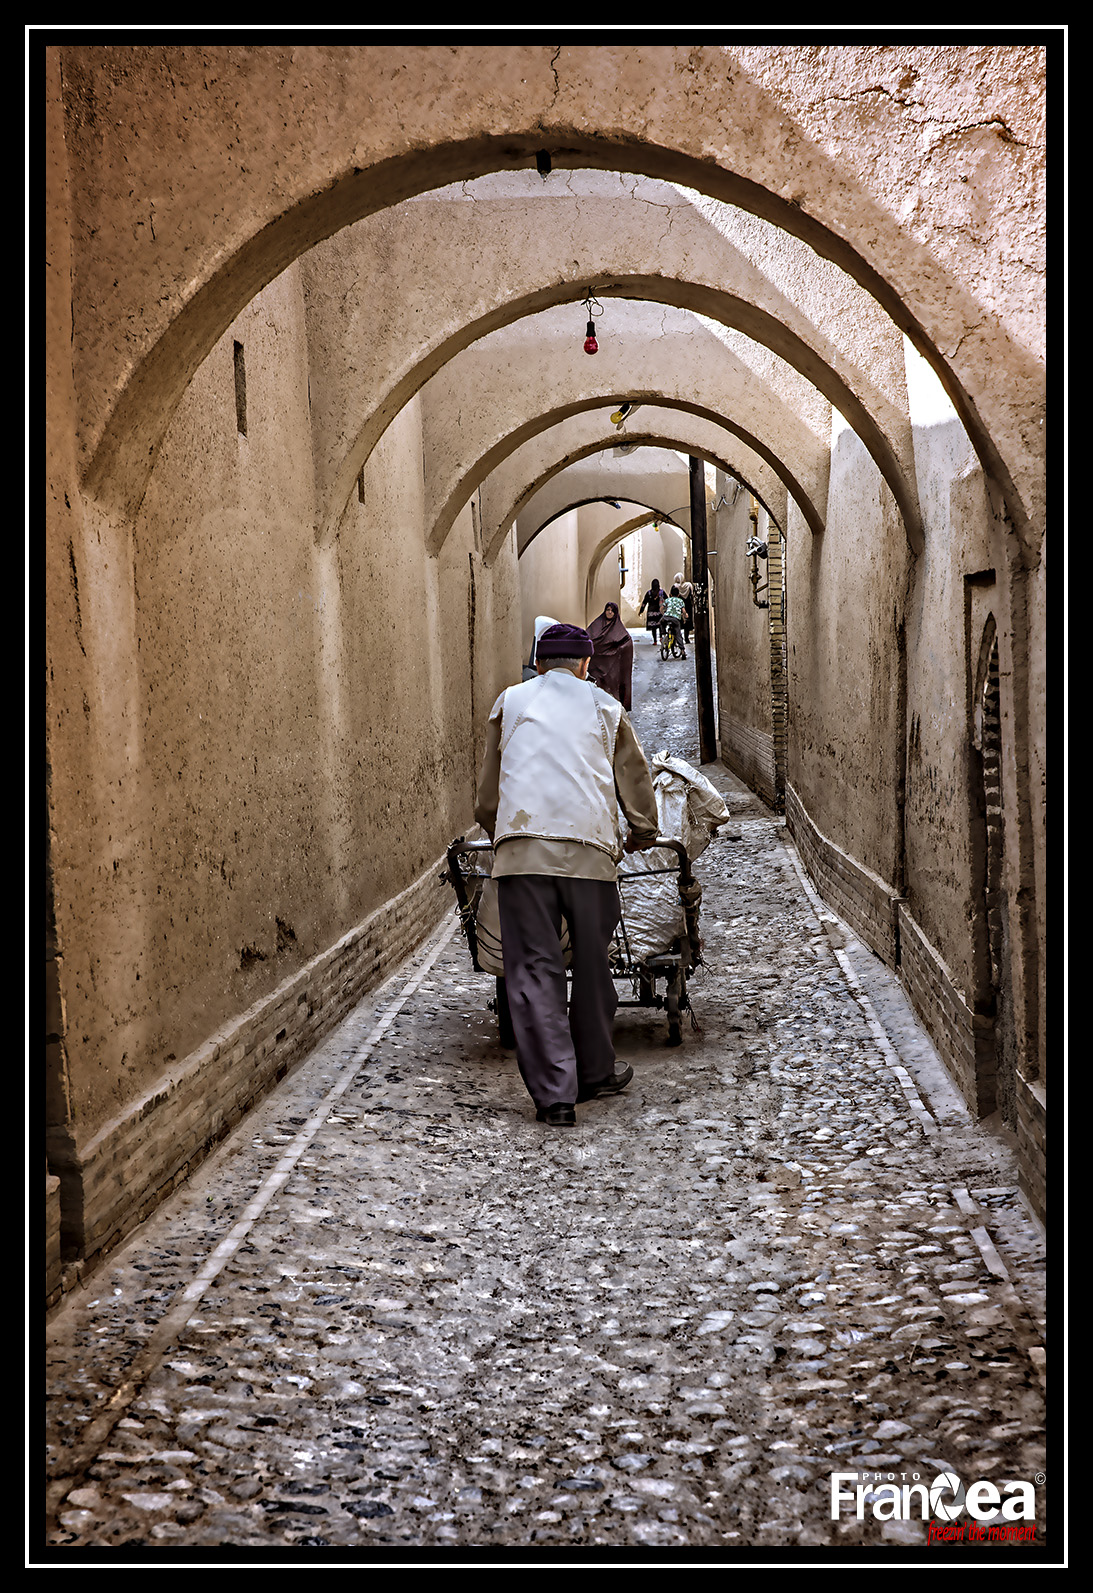 Iran_Yazd-Fran_Cea_Photography-033